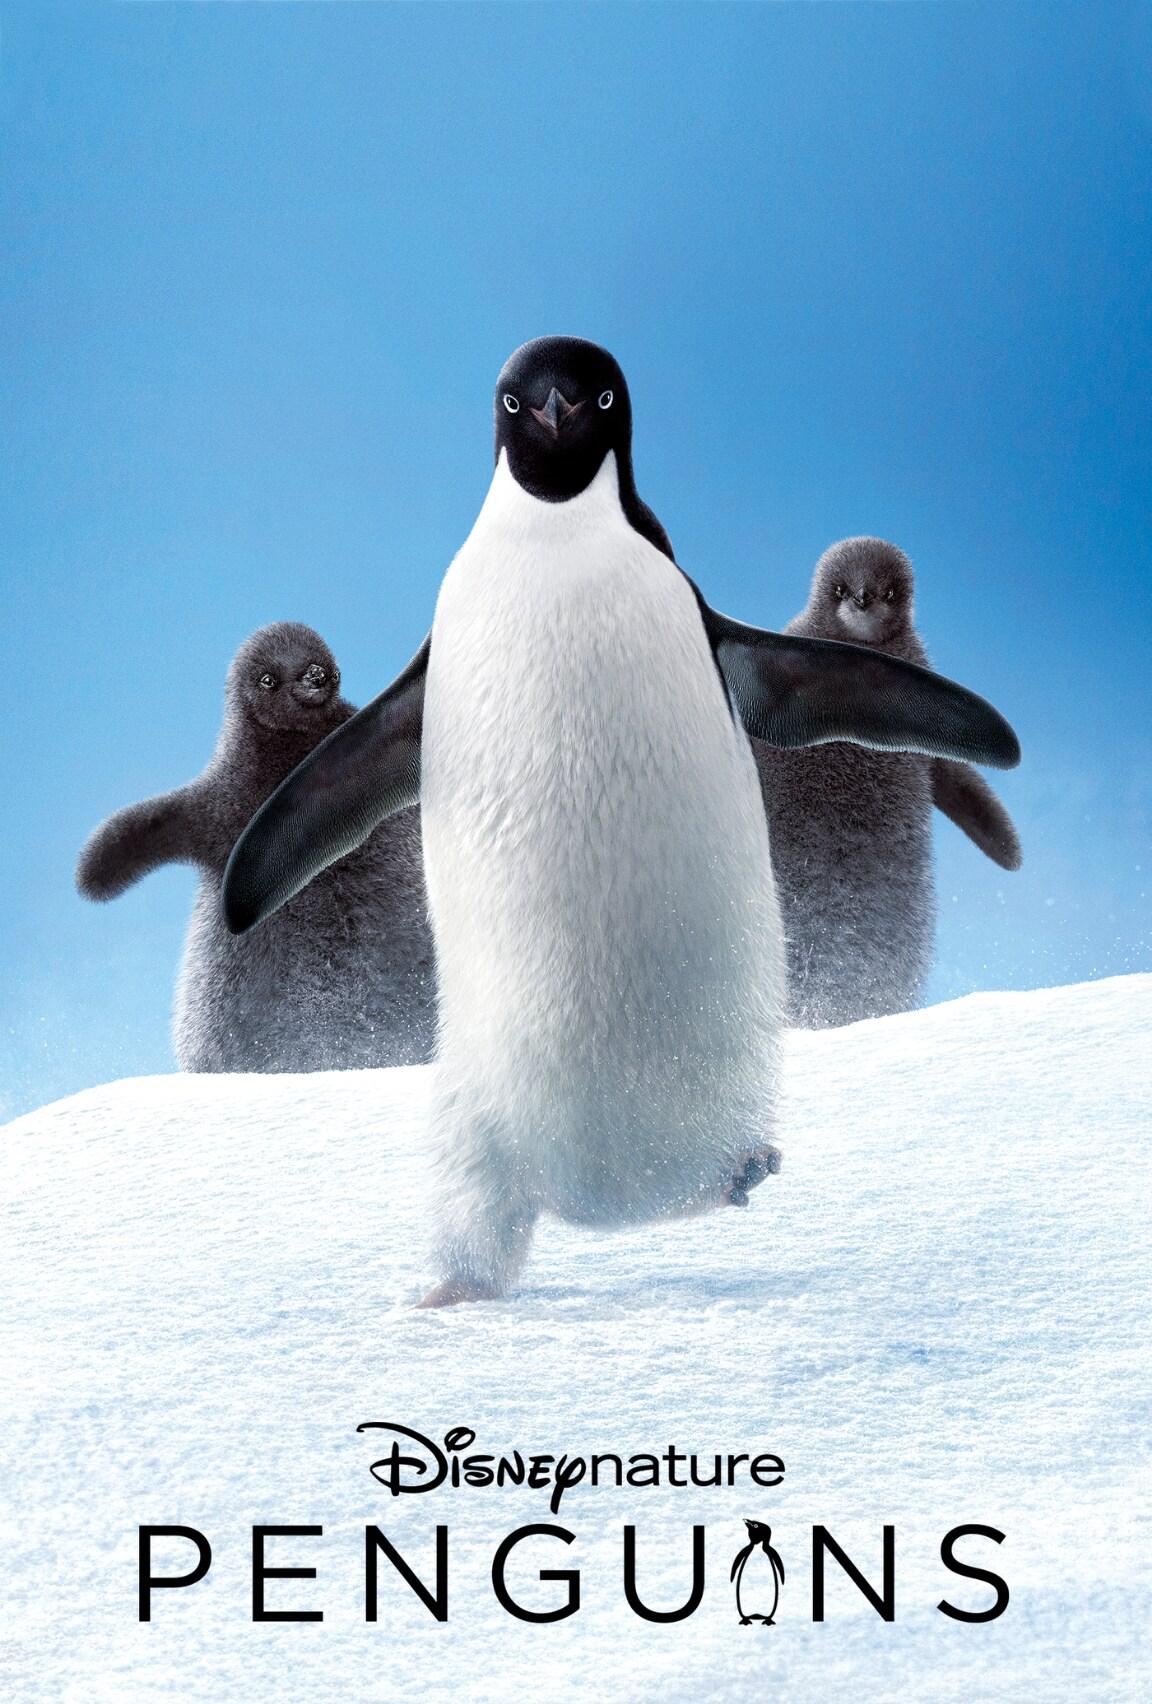 Penguins (2019)